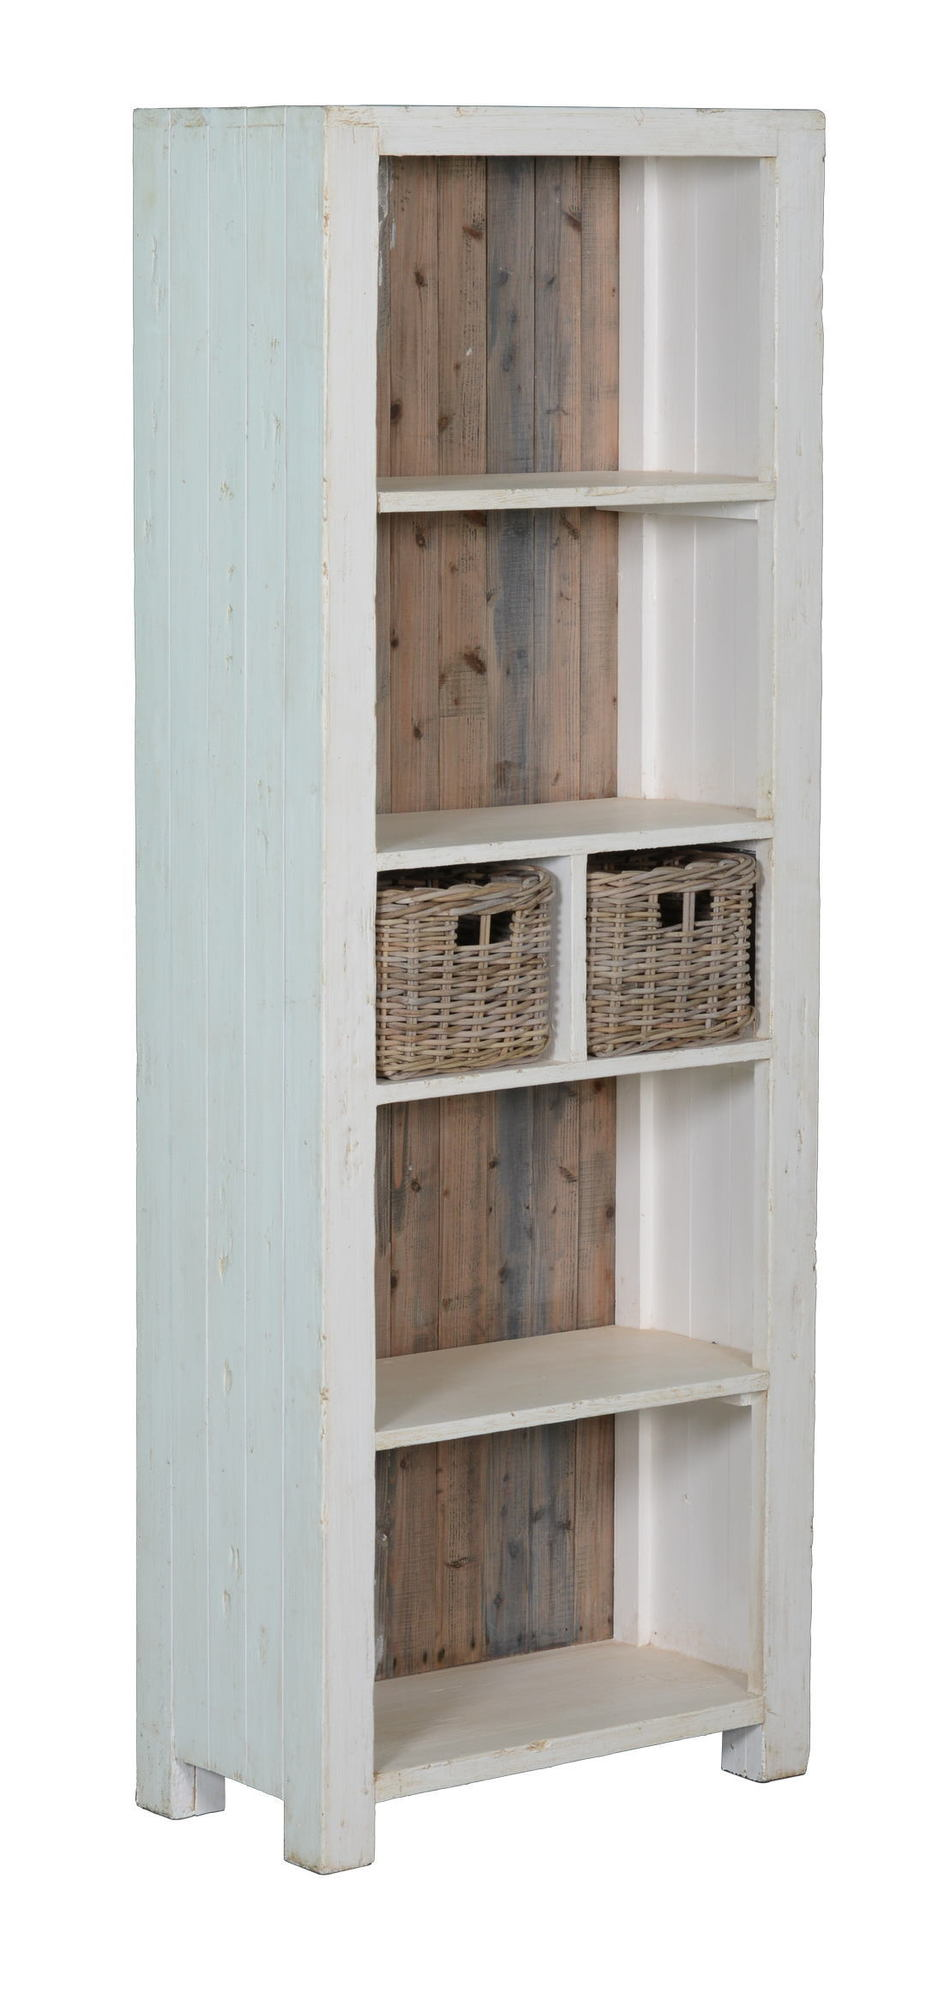 kasten-daan-boekenkast-towerliving-KL 0105-70cm-grenen-oud wit-grijs-vintage-mandjes